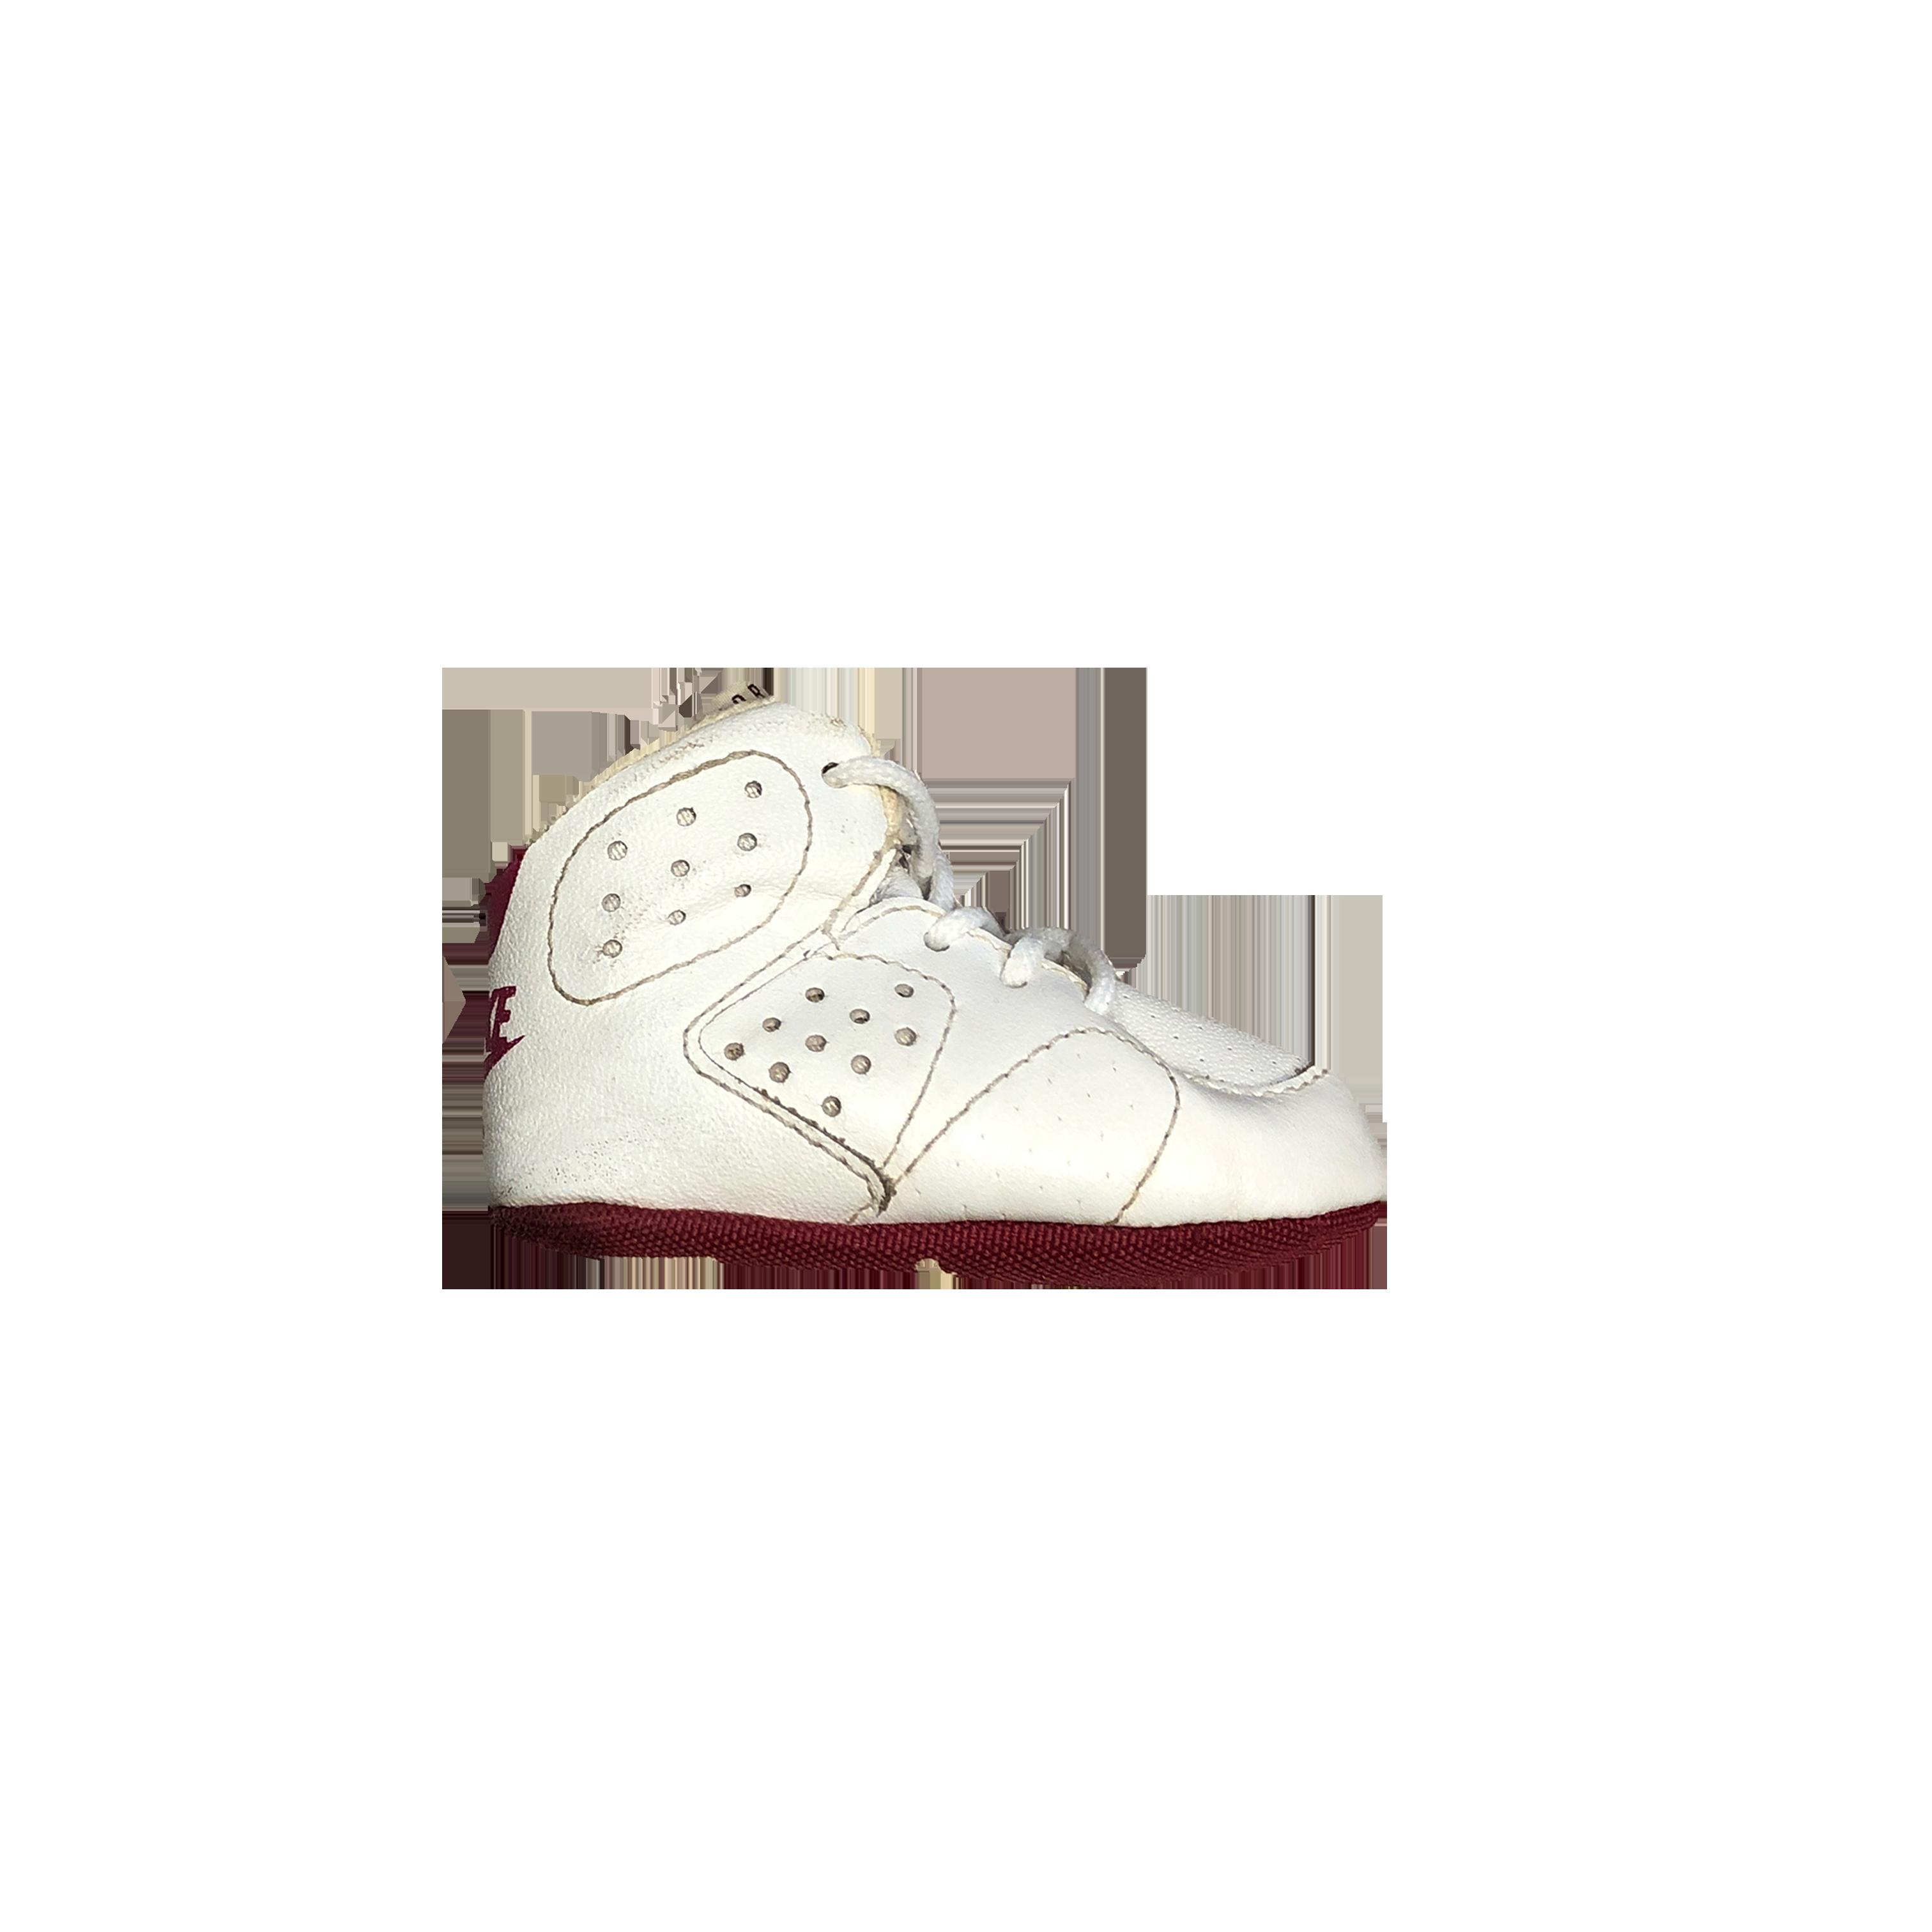 1991 Air Jordan 6 | Size 1 infant